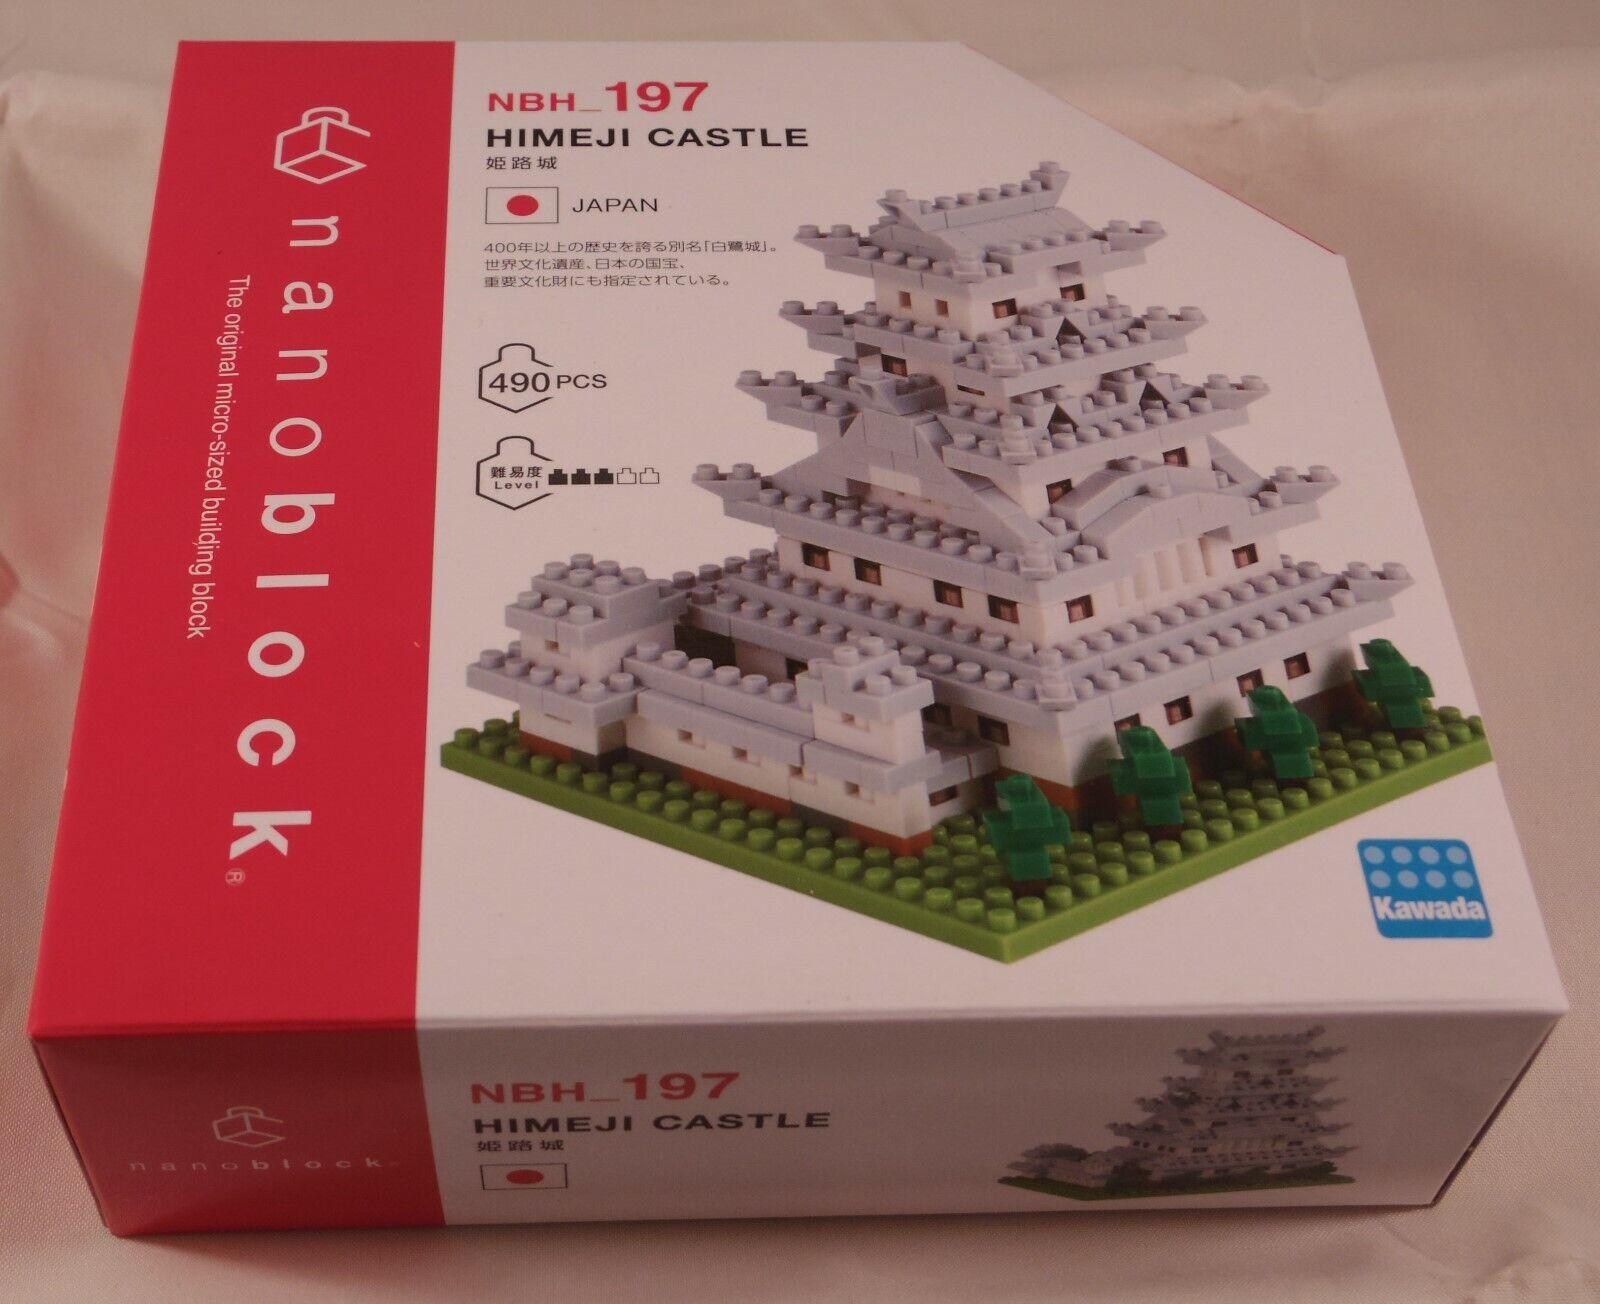 Plum Bonsai Nanoblock Micro Sized Building Block Constructrion Toy Kawada NBH134